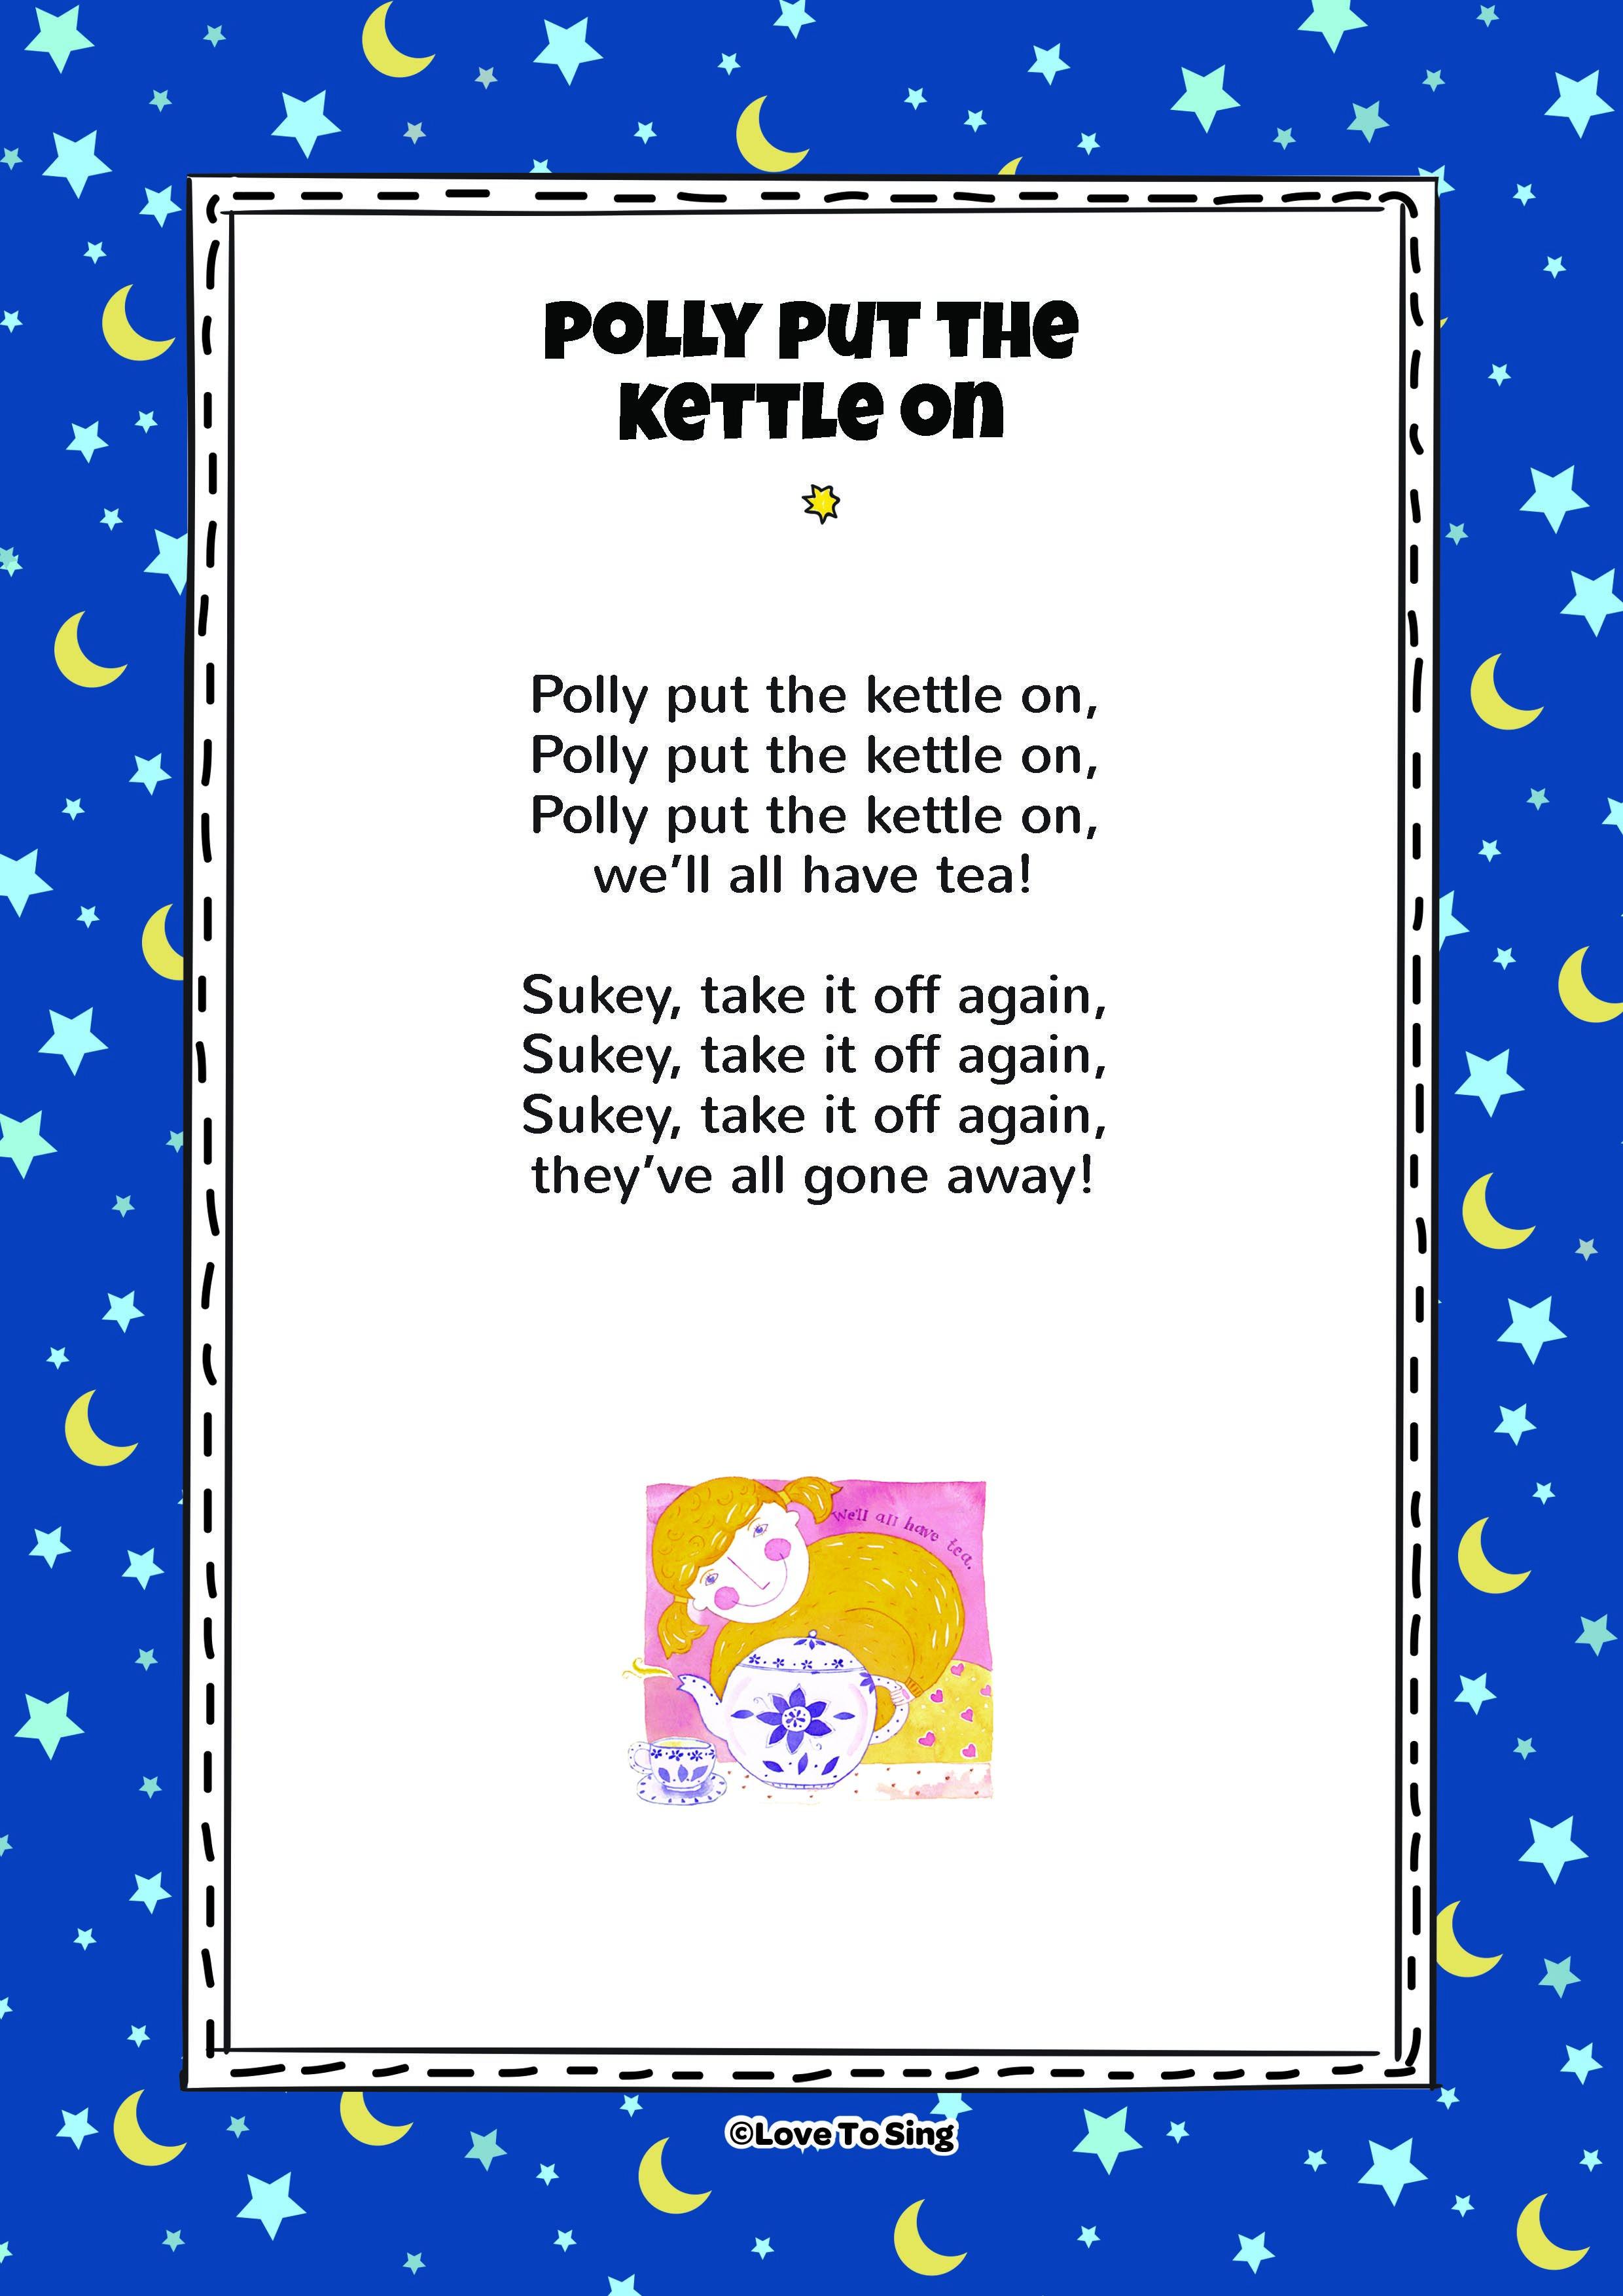 Nursery Rhyme Polly Put The Kettle On Kids Will Love This Fun Sing Along Free Lyricusic Our Website Lovetosing Nurseryrhymes Freelyrics